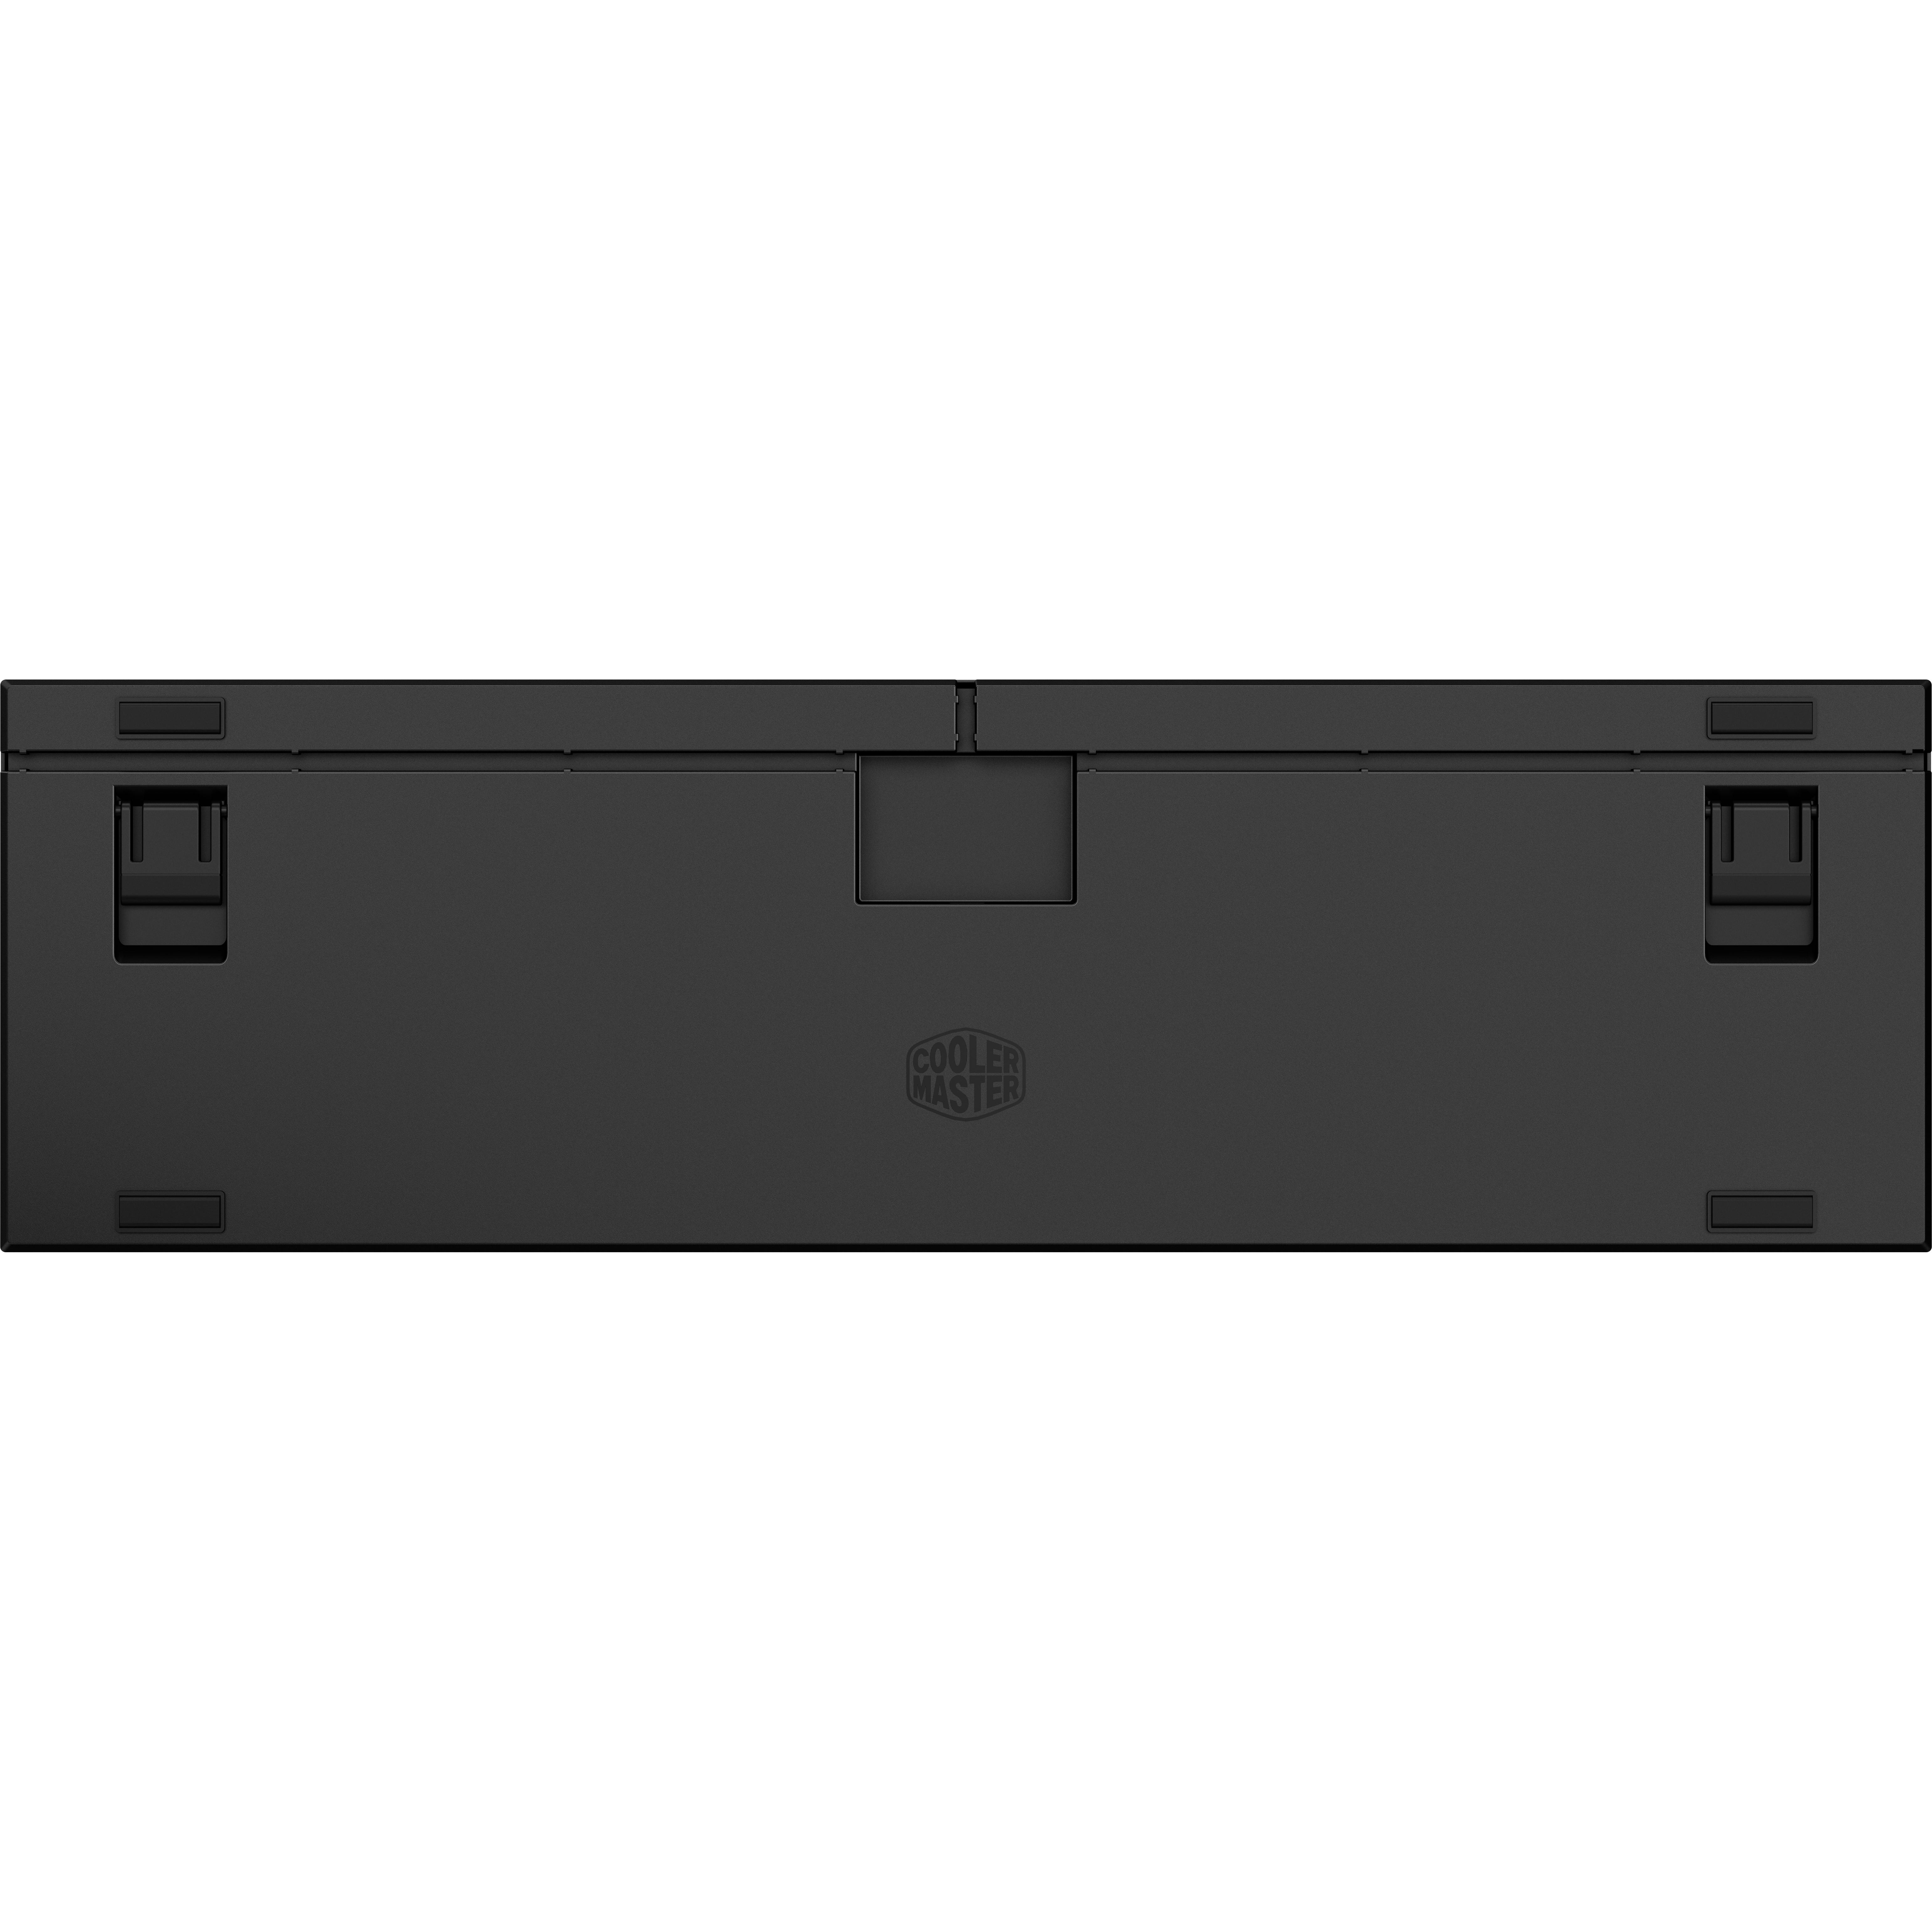 Cooler Master Masterkeys Pro L Mechanical Keyboard - Black